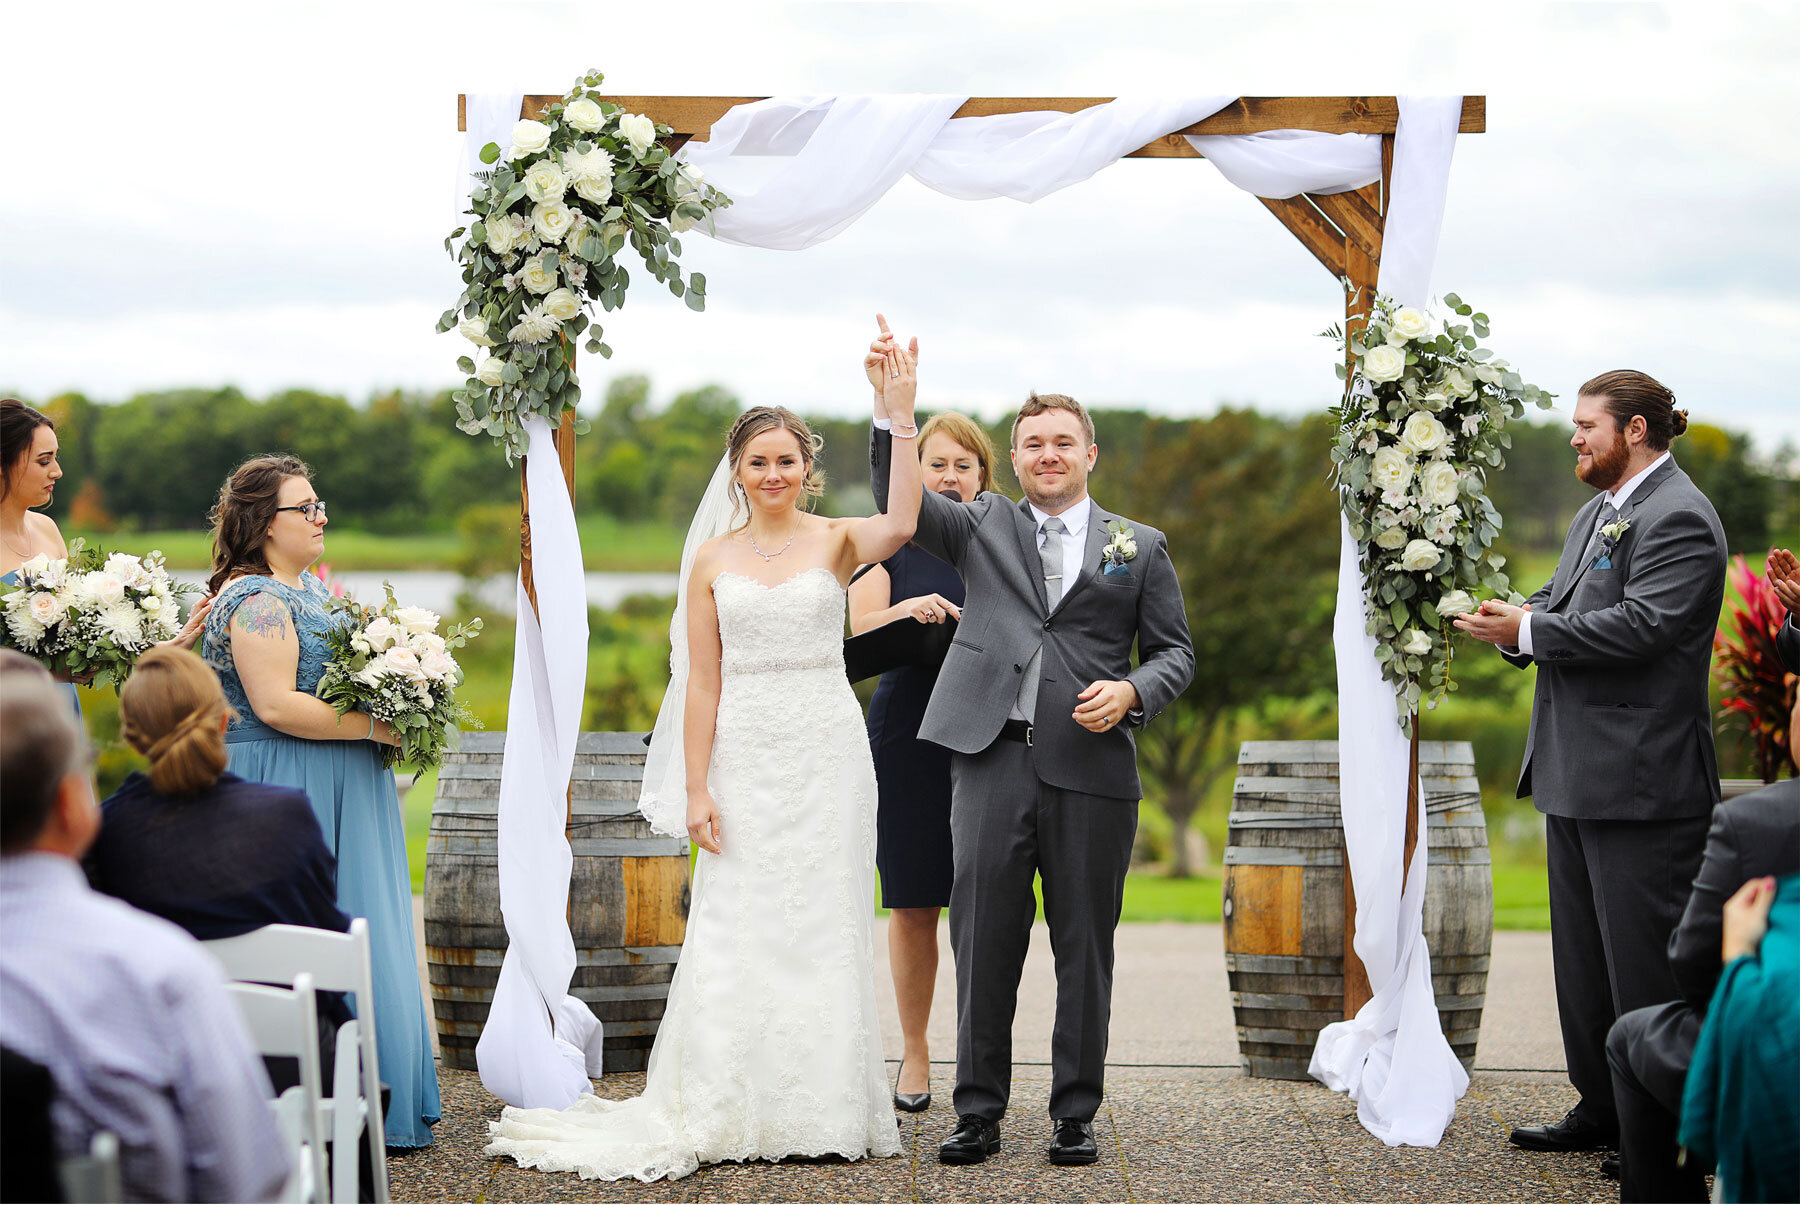 12-Vick-Photography-Minneapolis-Minnesota-Wedding-Rush-Creek-Golf-Club-Ceremony-Outdoor-Bride-Groom-Amanda-and-Michael.jpg